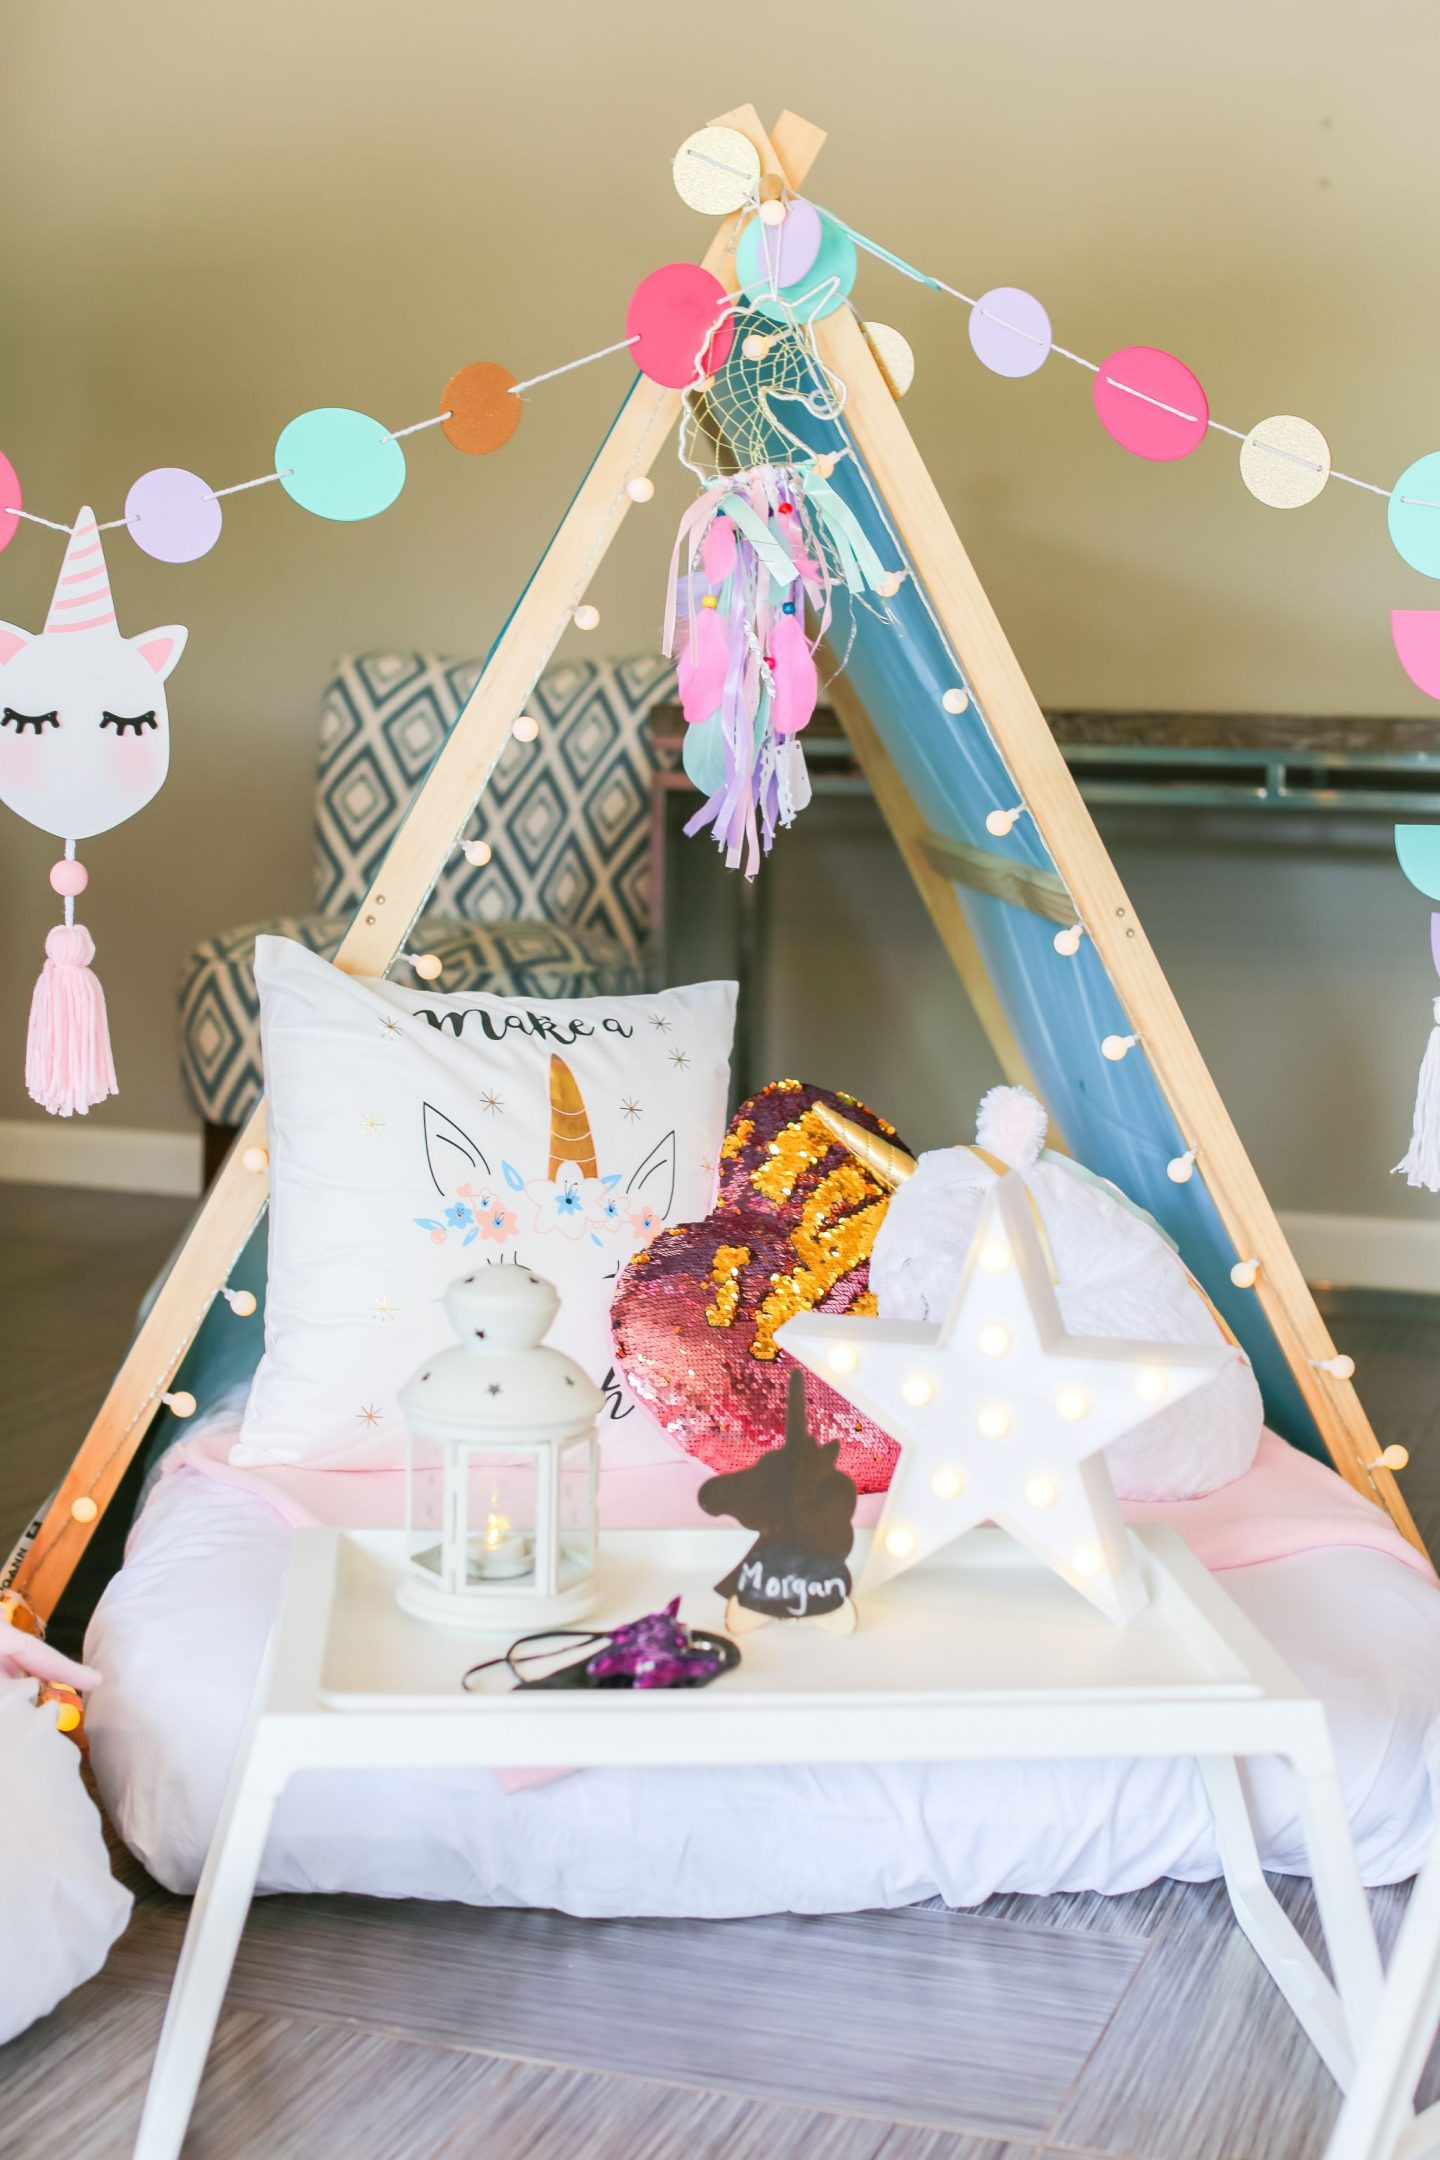 SLUMBER PARTY IDEAS, KIDS BIRTHDAY PARTIES, MOM BLOGGER